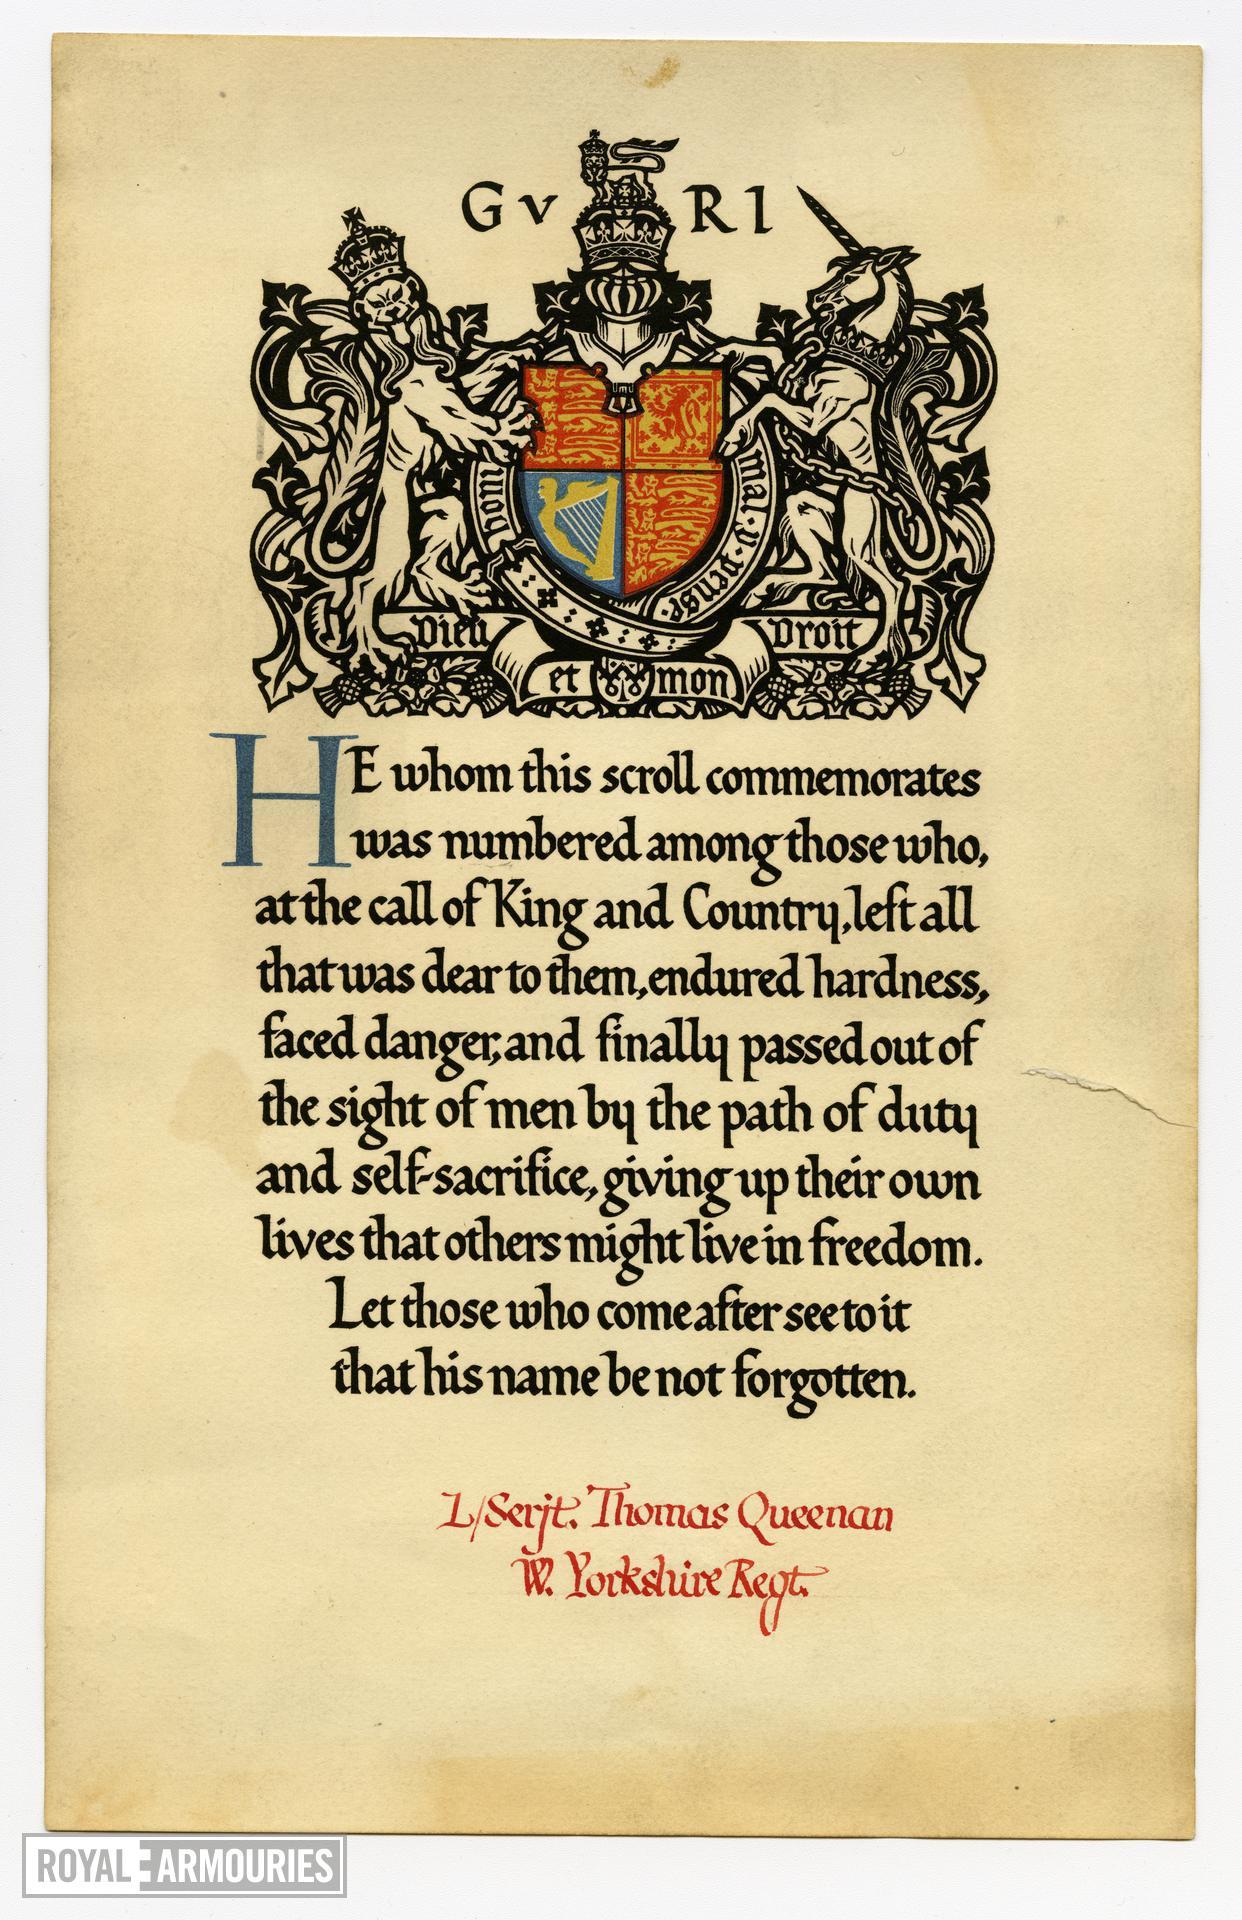 Memorial Scroll to Lance Sergeant Thomas Queenan, 1st West Yorkshire Regiment. (XVIII.461)